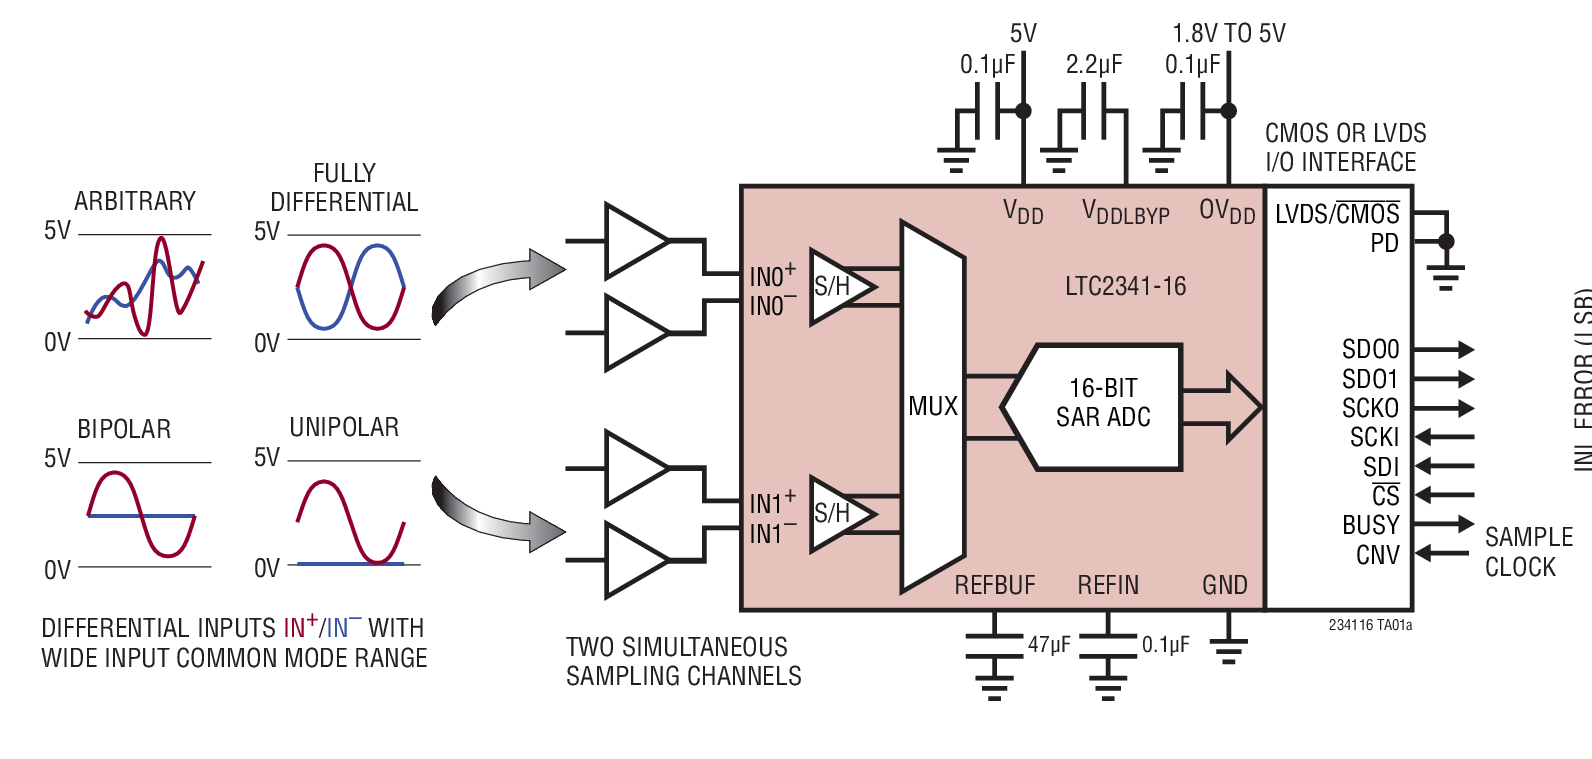 ltc2341cuh-16-集成电路-51电子网